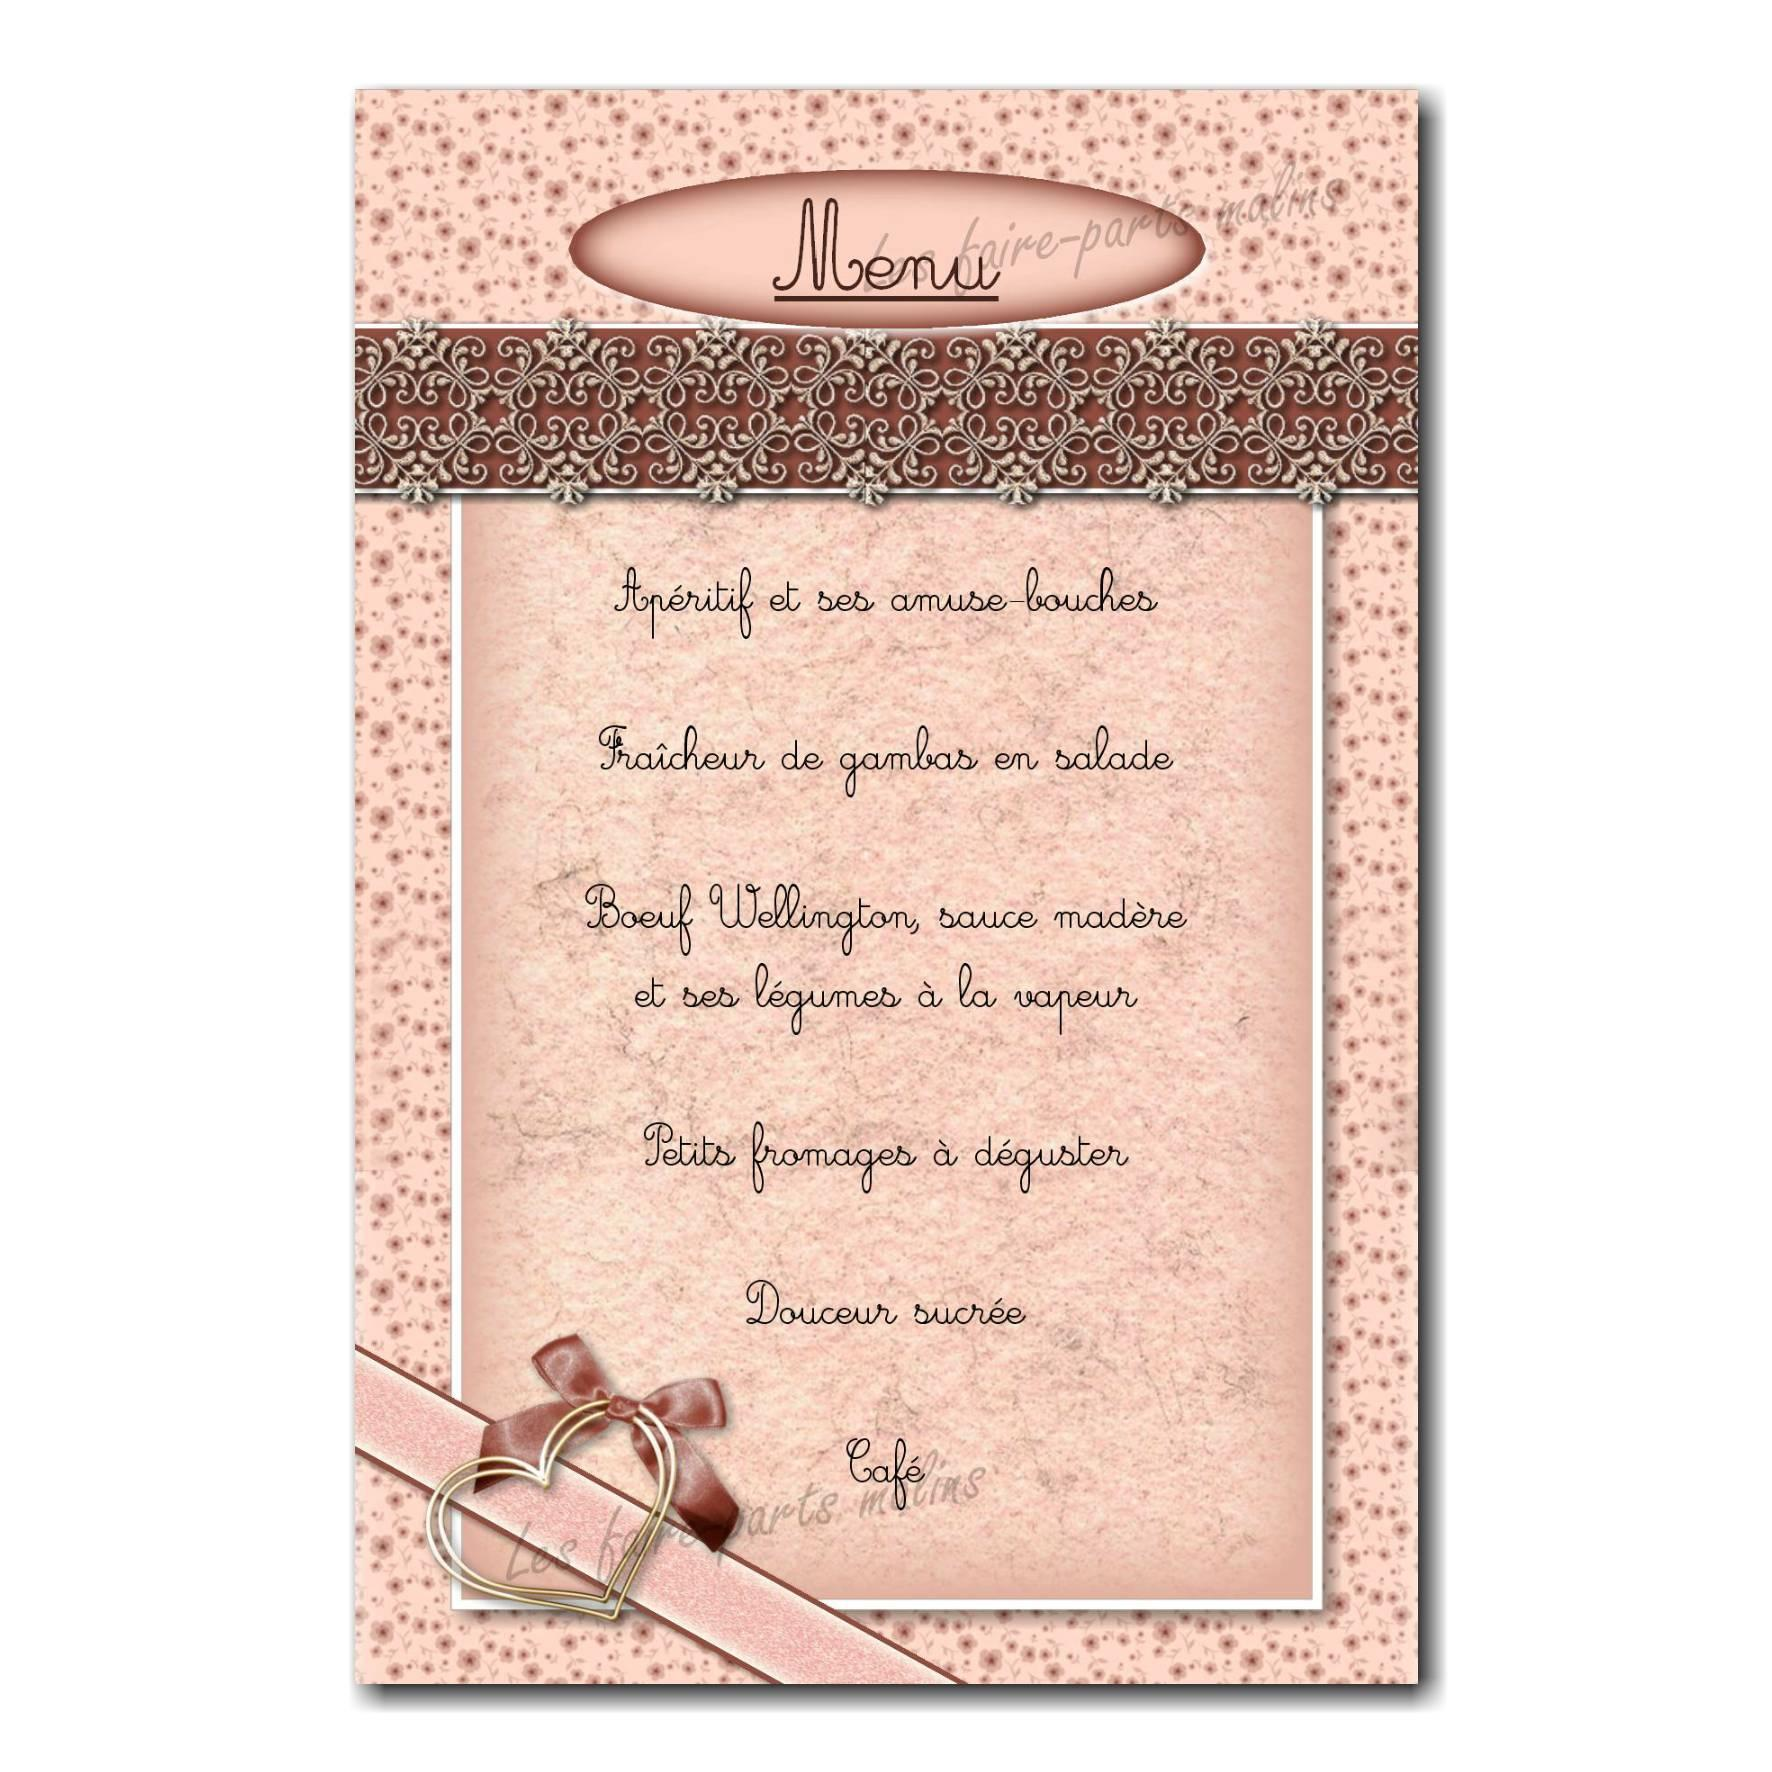 Menu coeur ruban marron clair romantique